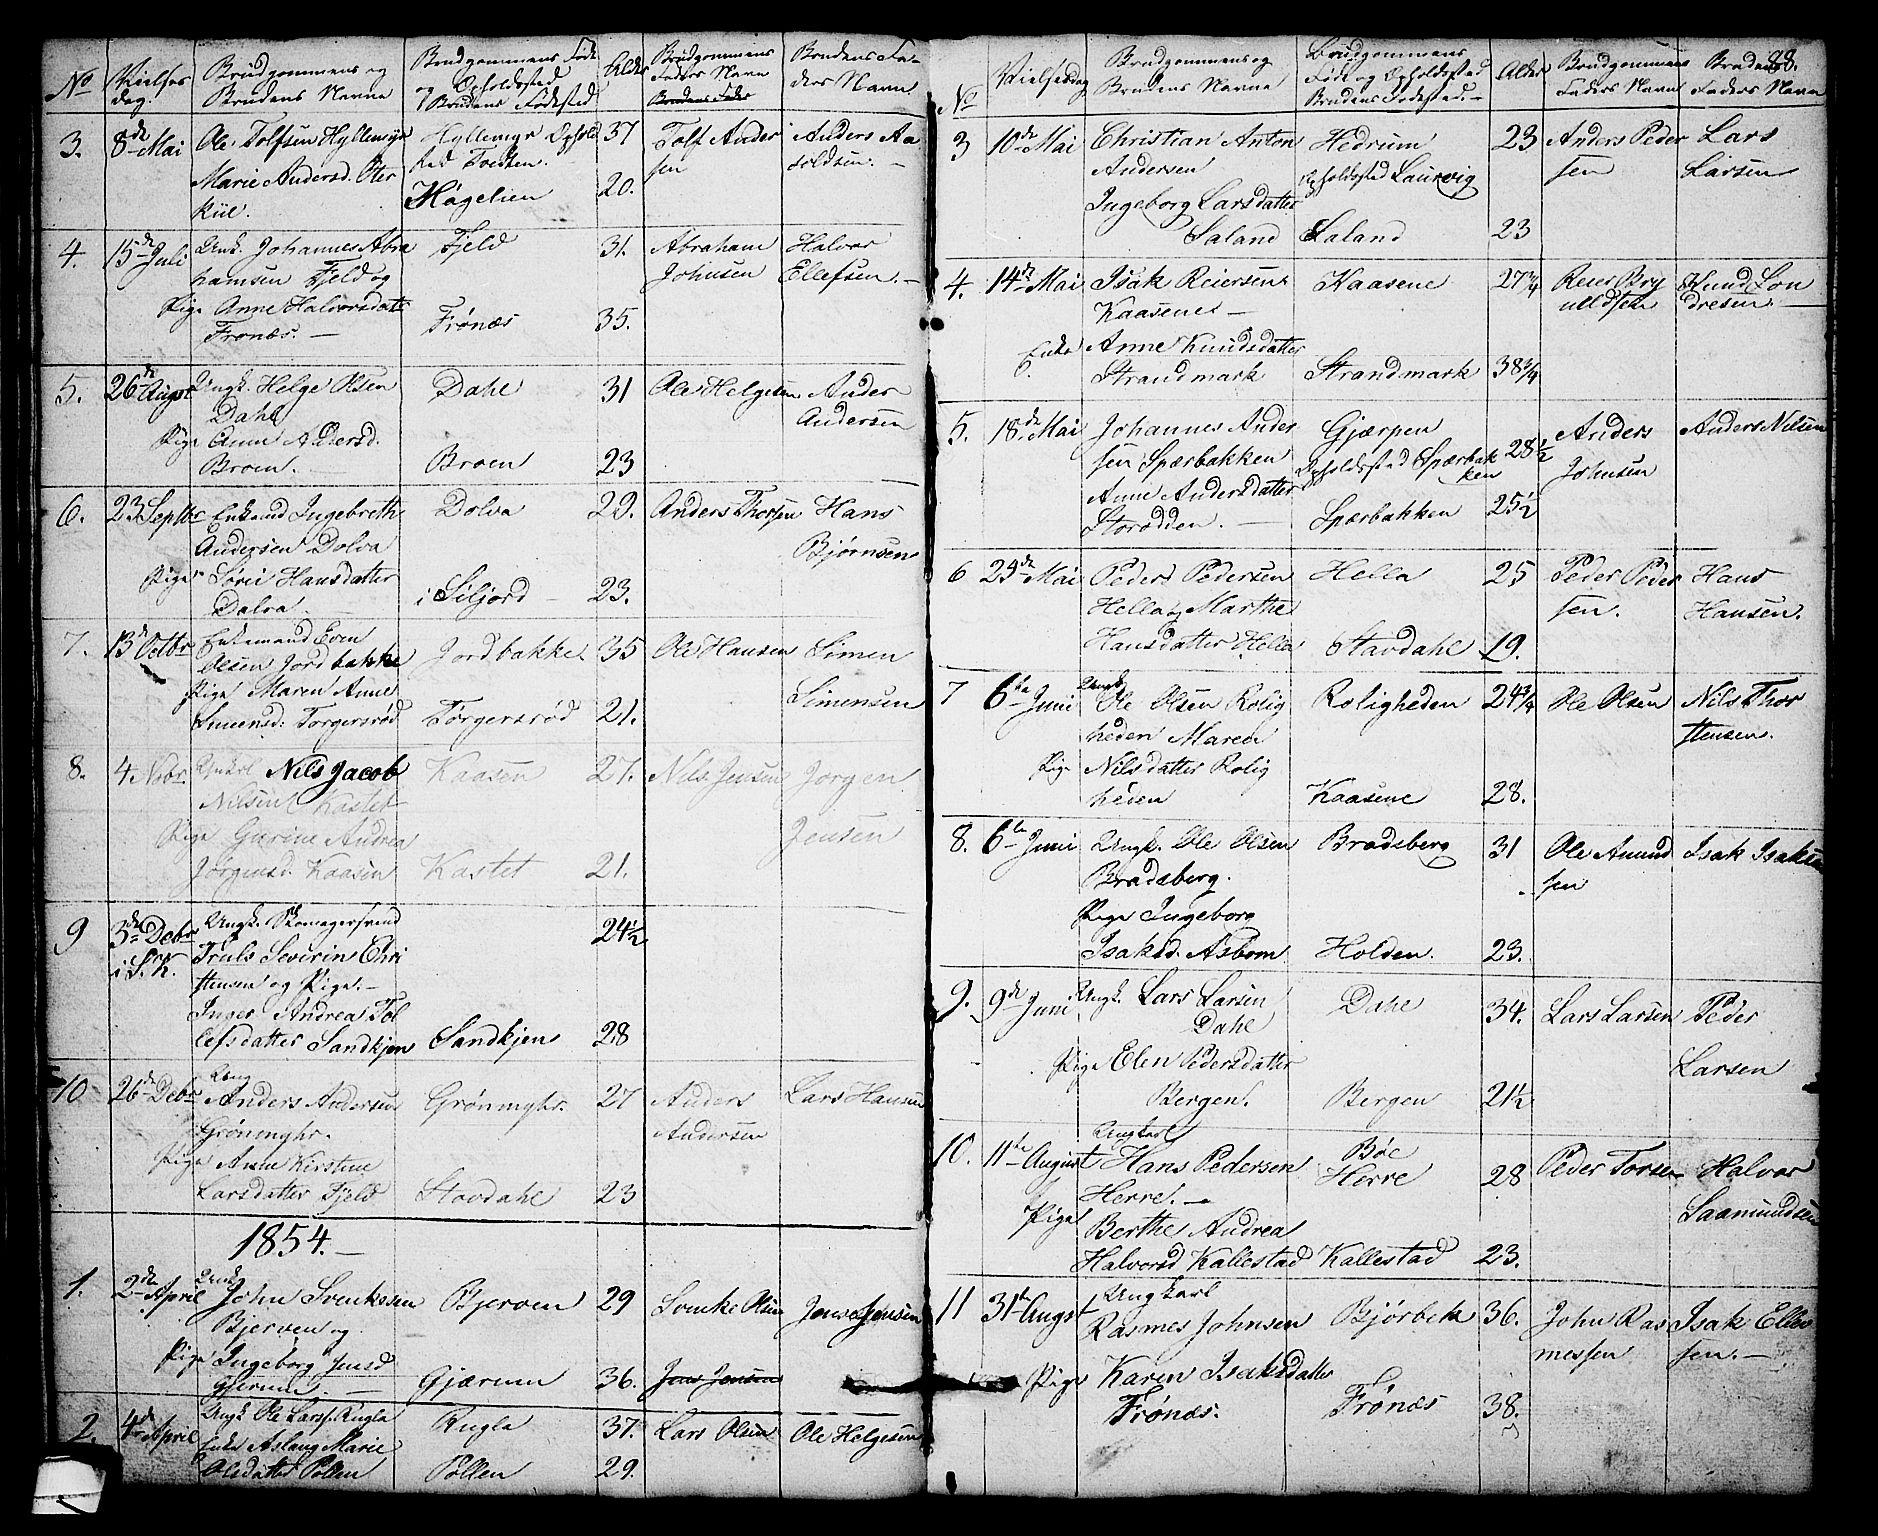 SAKO, Solum kirkebøker, G/Gb/L0001: Klokkerbok nr. II 1, 1848-1859, s. 88